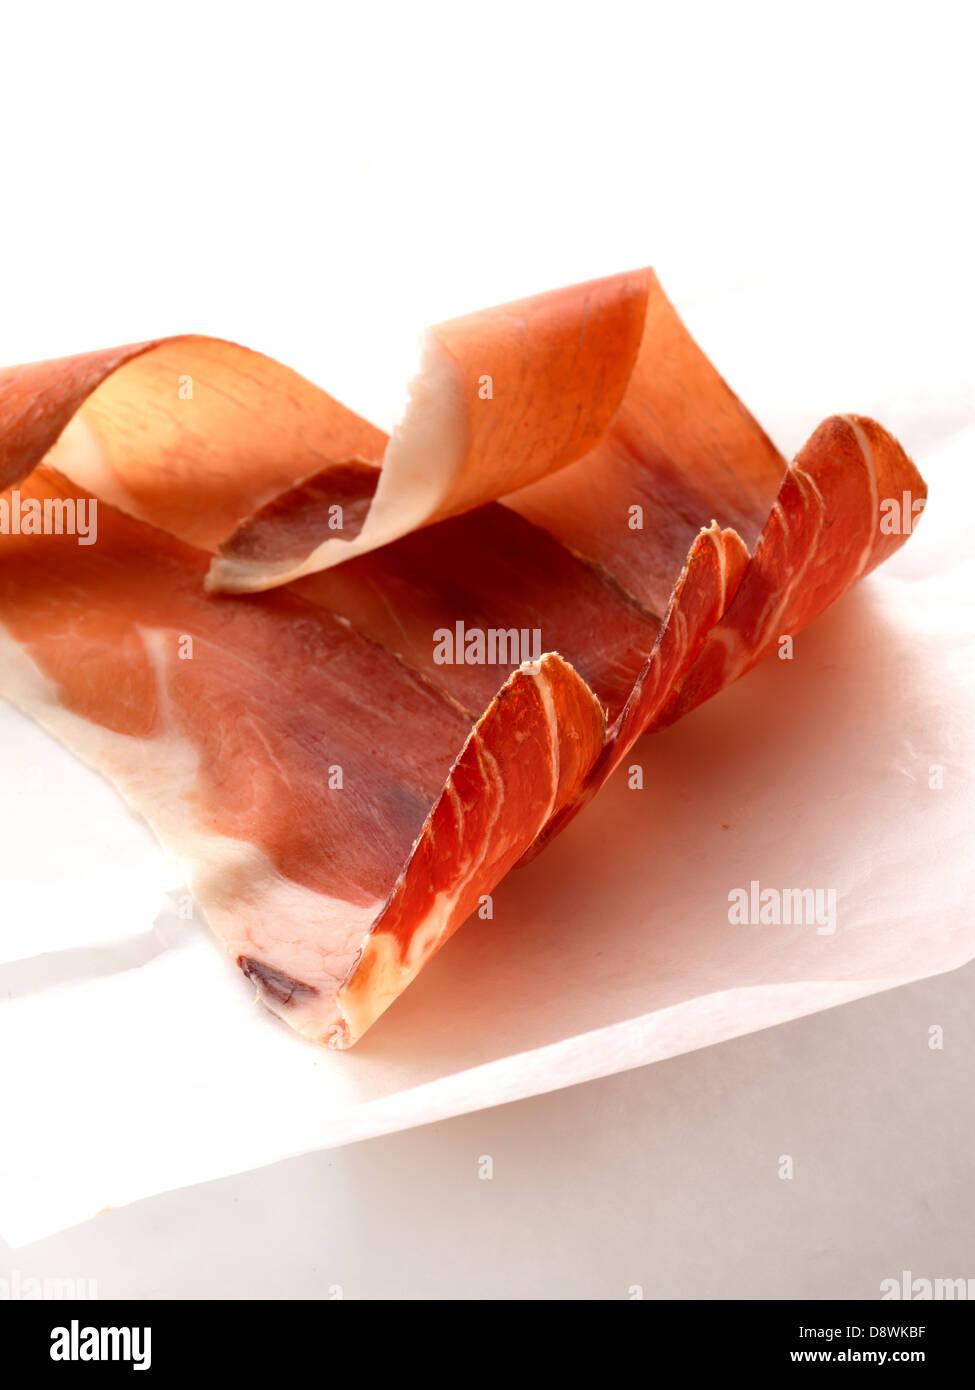 Tranches de jambon cru Photo Stock